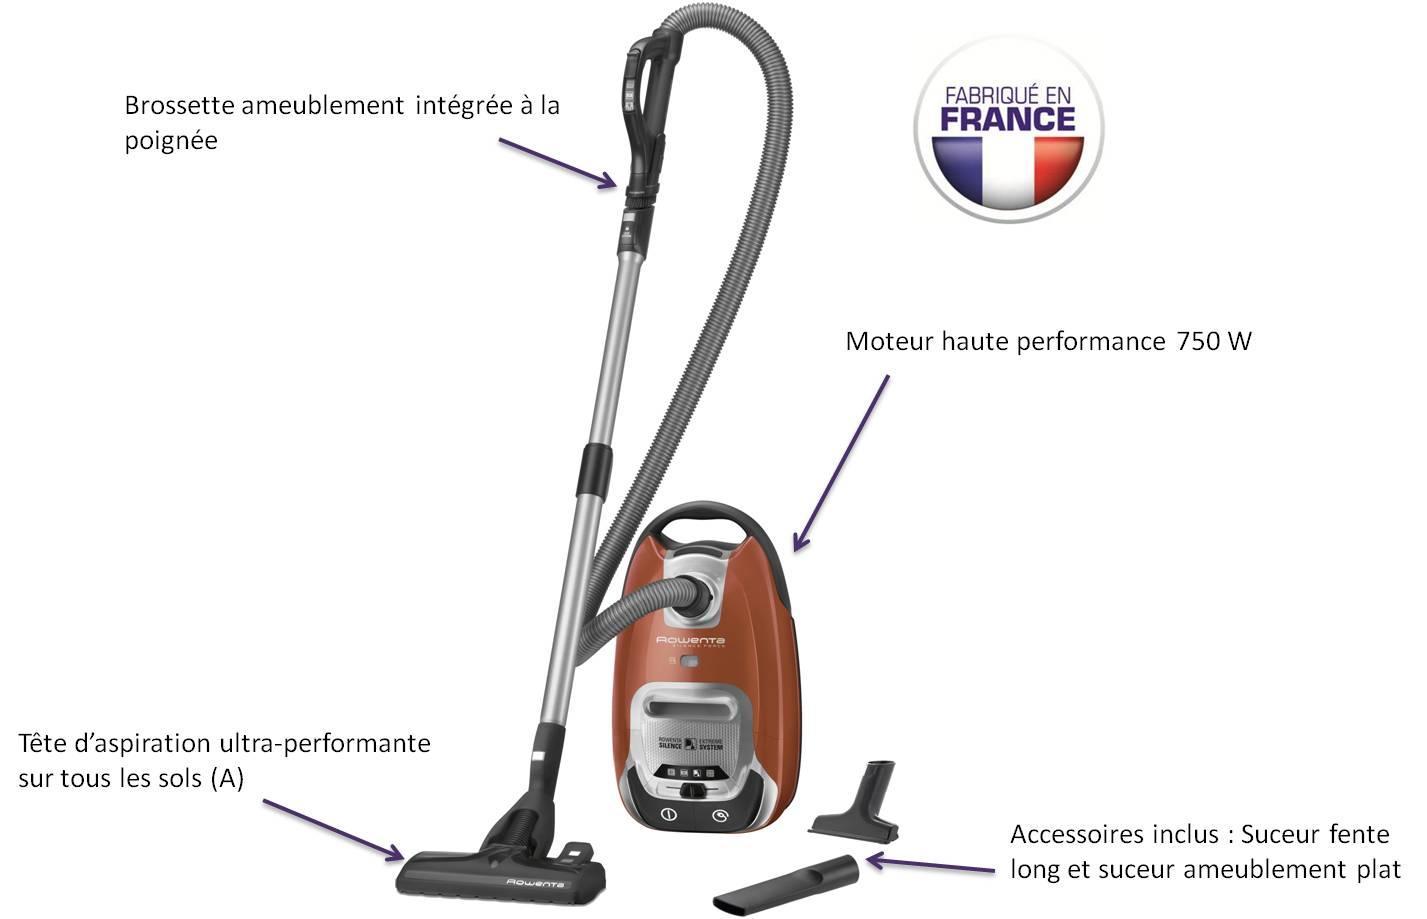 Rowenta ro6432ea aspirateur avec sac silence force 4a - Sac aspirateur rowenta silence force 2200w ...